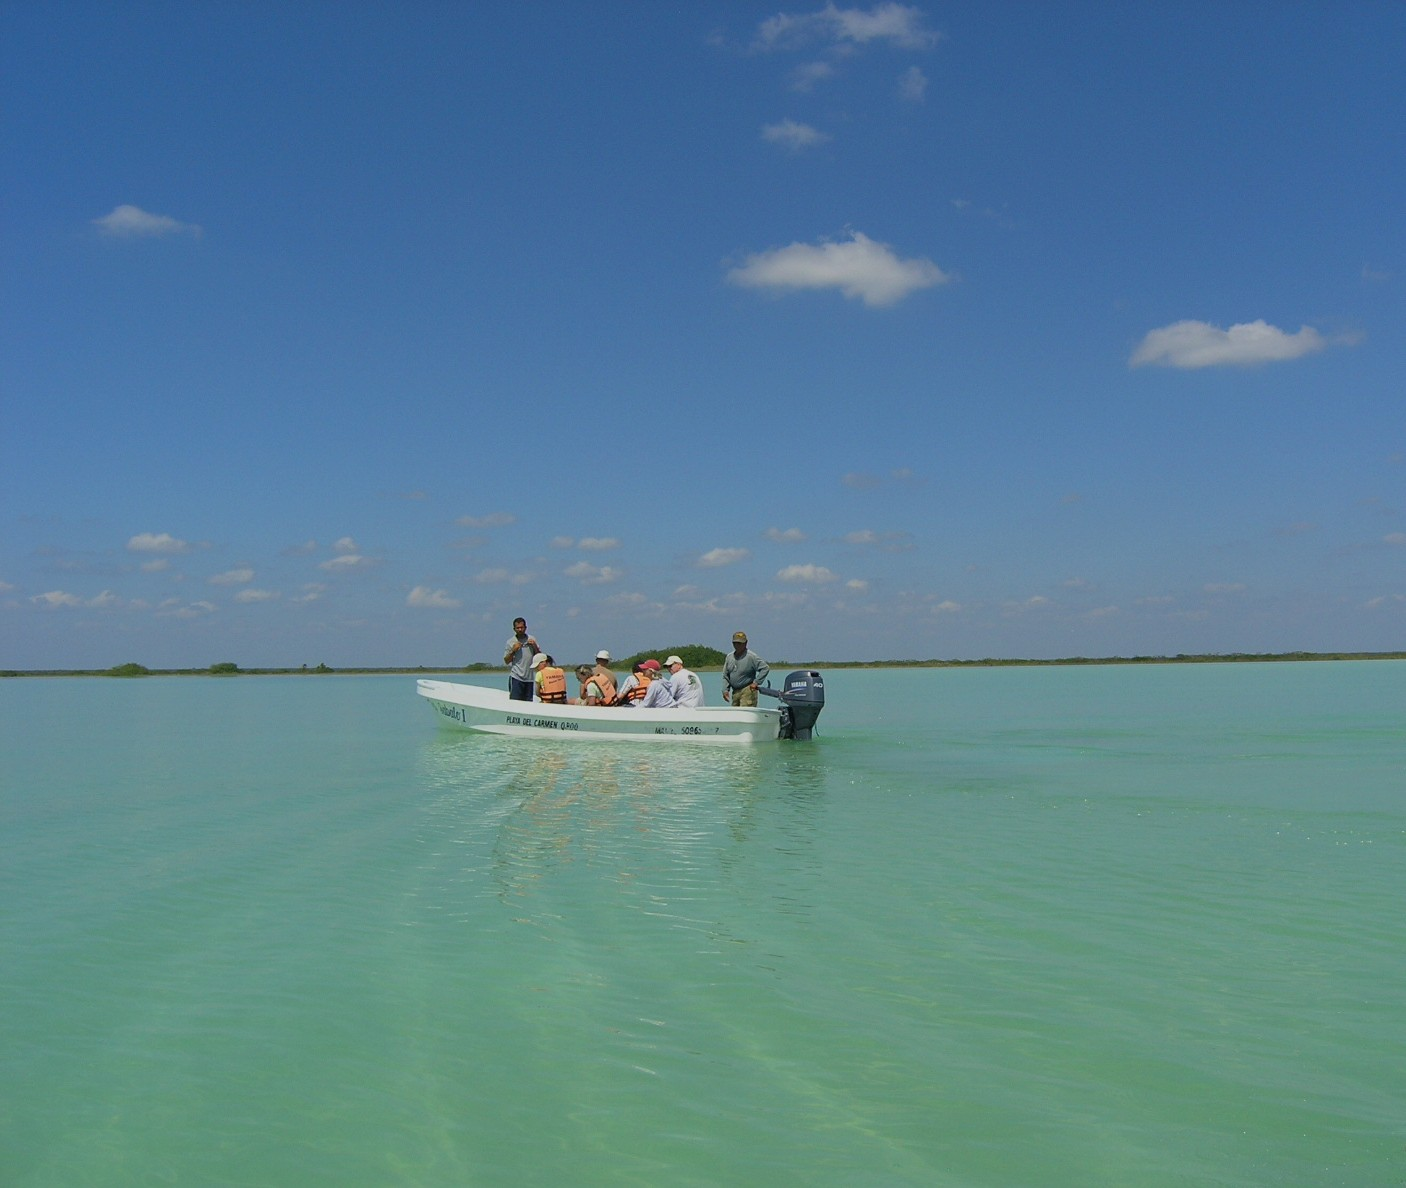 Feb 28 Lake Manuel's Boat.jpg